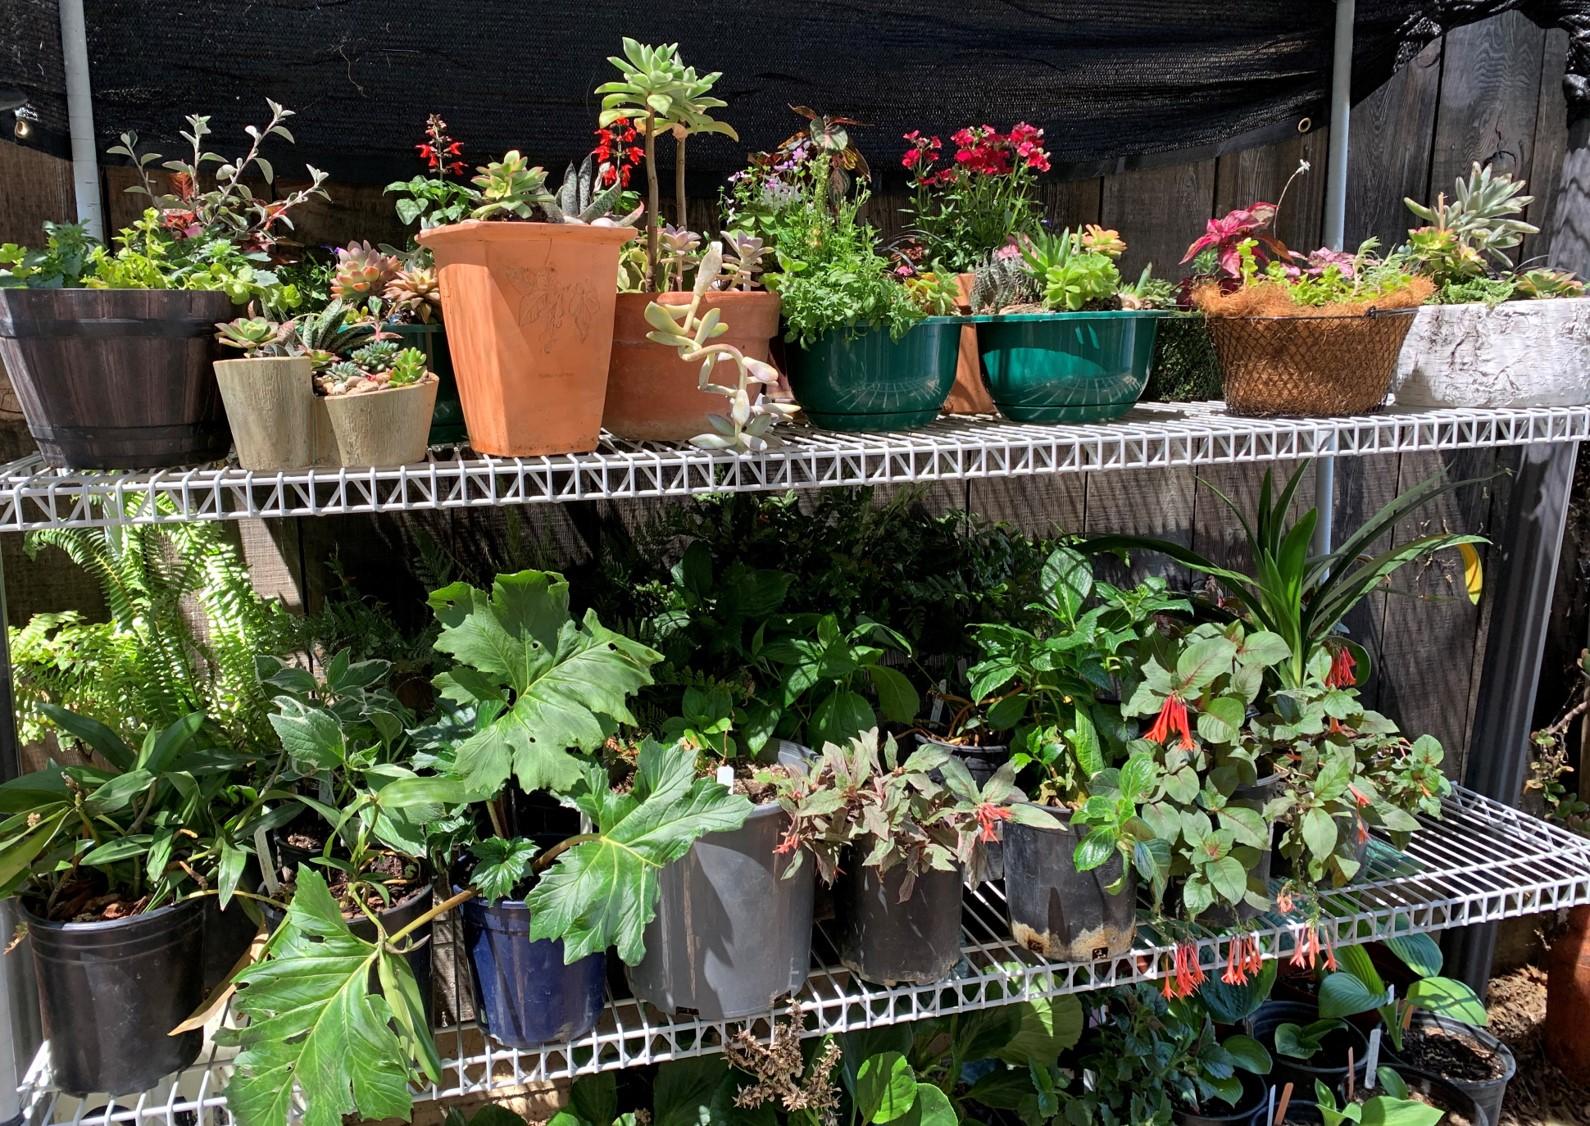 Clayton Valley Garden Club Annual Plant Sale, May 8